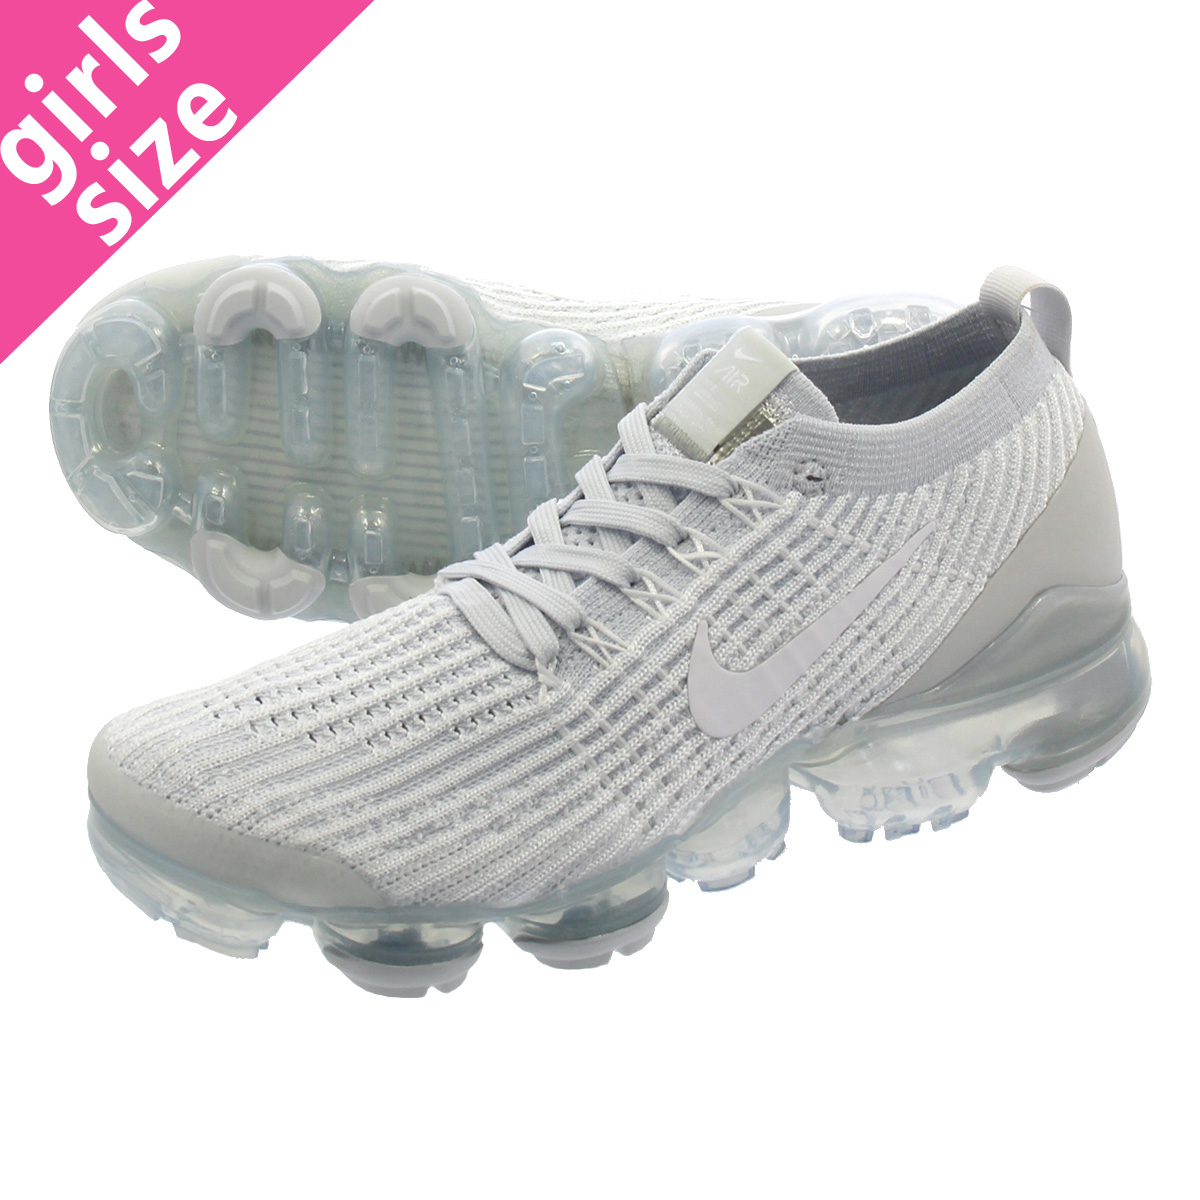 cb6ae30064c62 NIKE WMNS AIR VAPORMAX FLYKNIT 3 Nike women vapor max fried food knit 3  WHITE WHITE PURE PLATINUM METALLIC SILVER aj6910-100